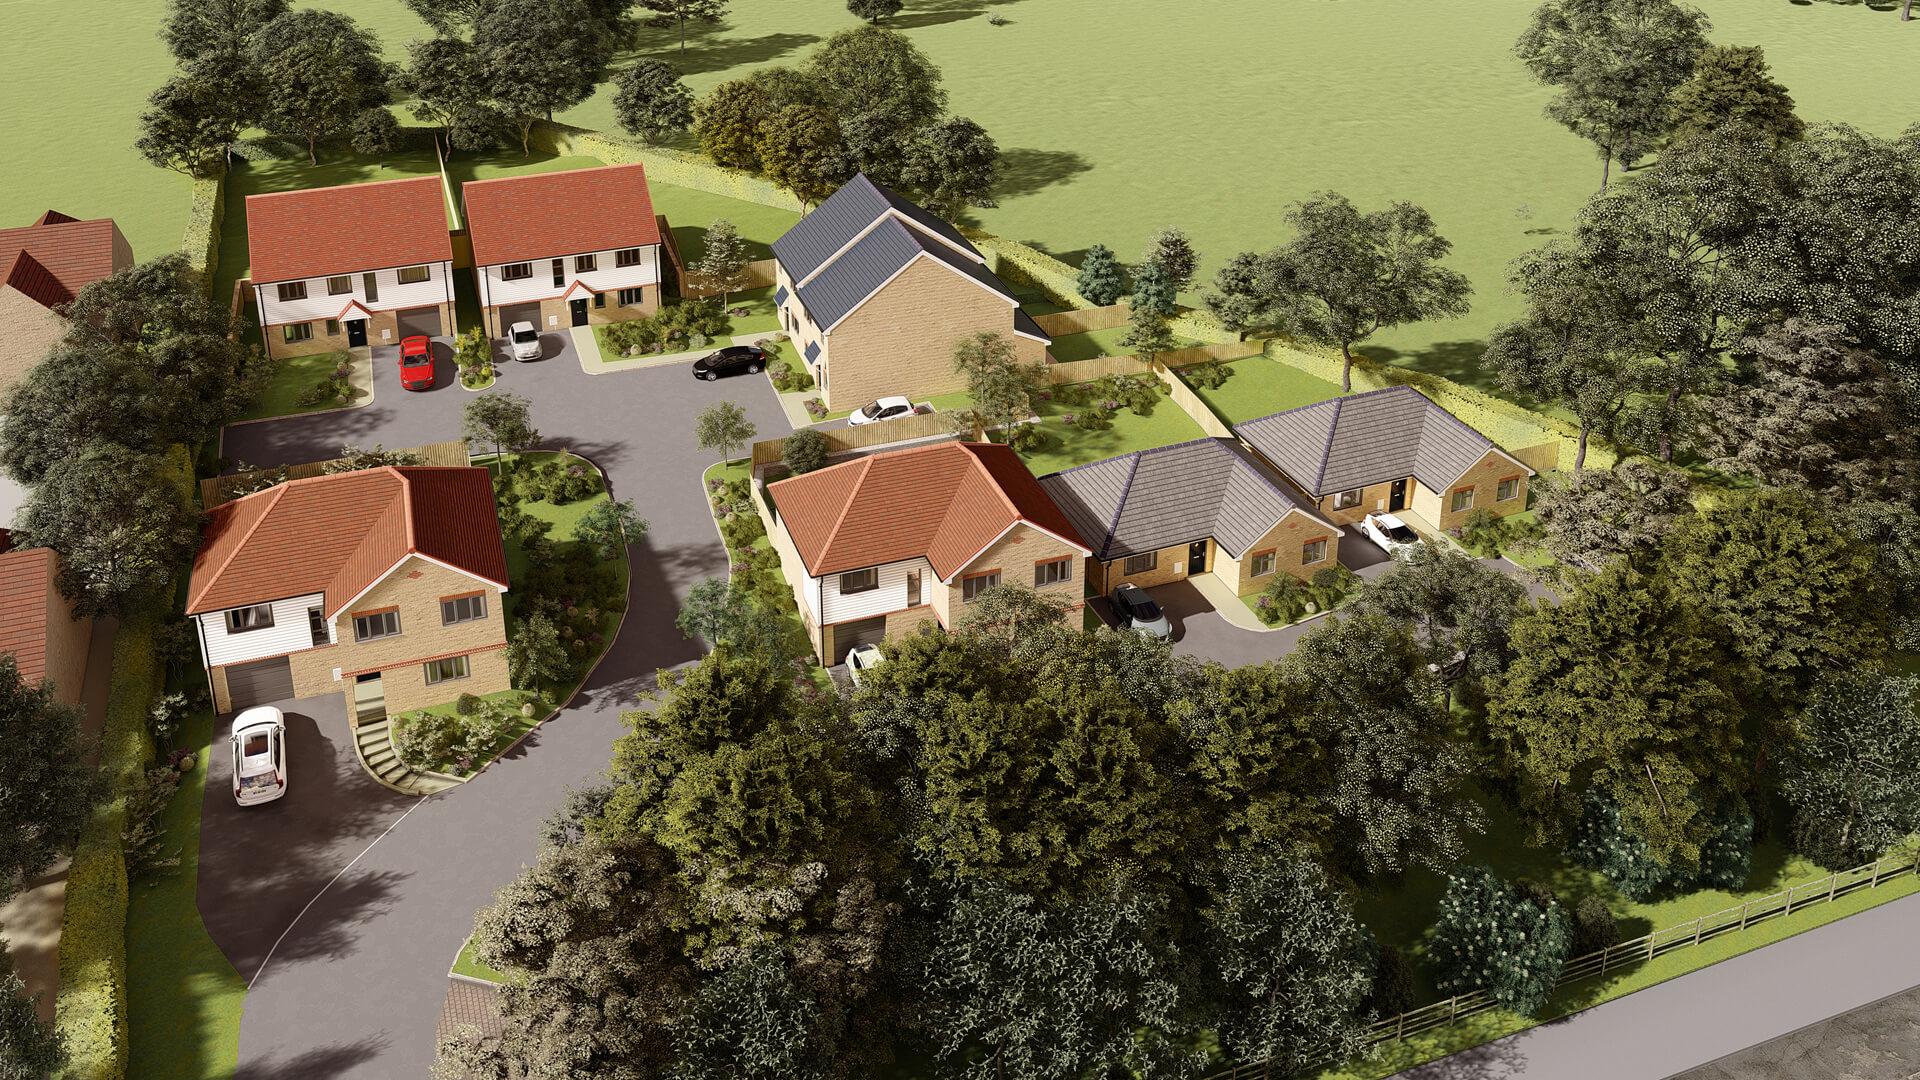 Woodside Court CGI 3D Plan